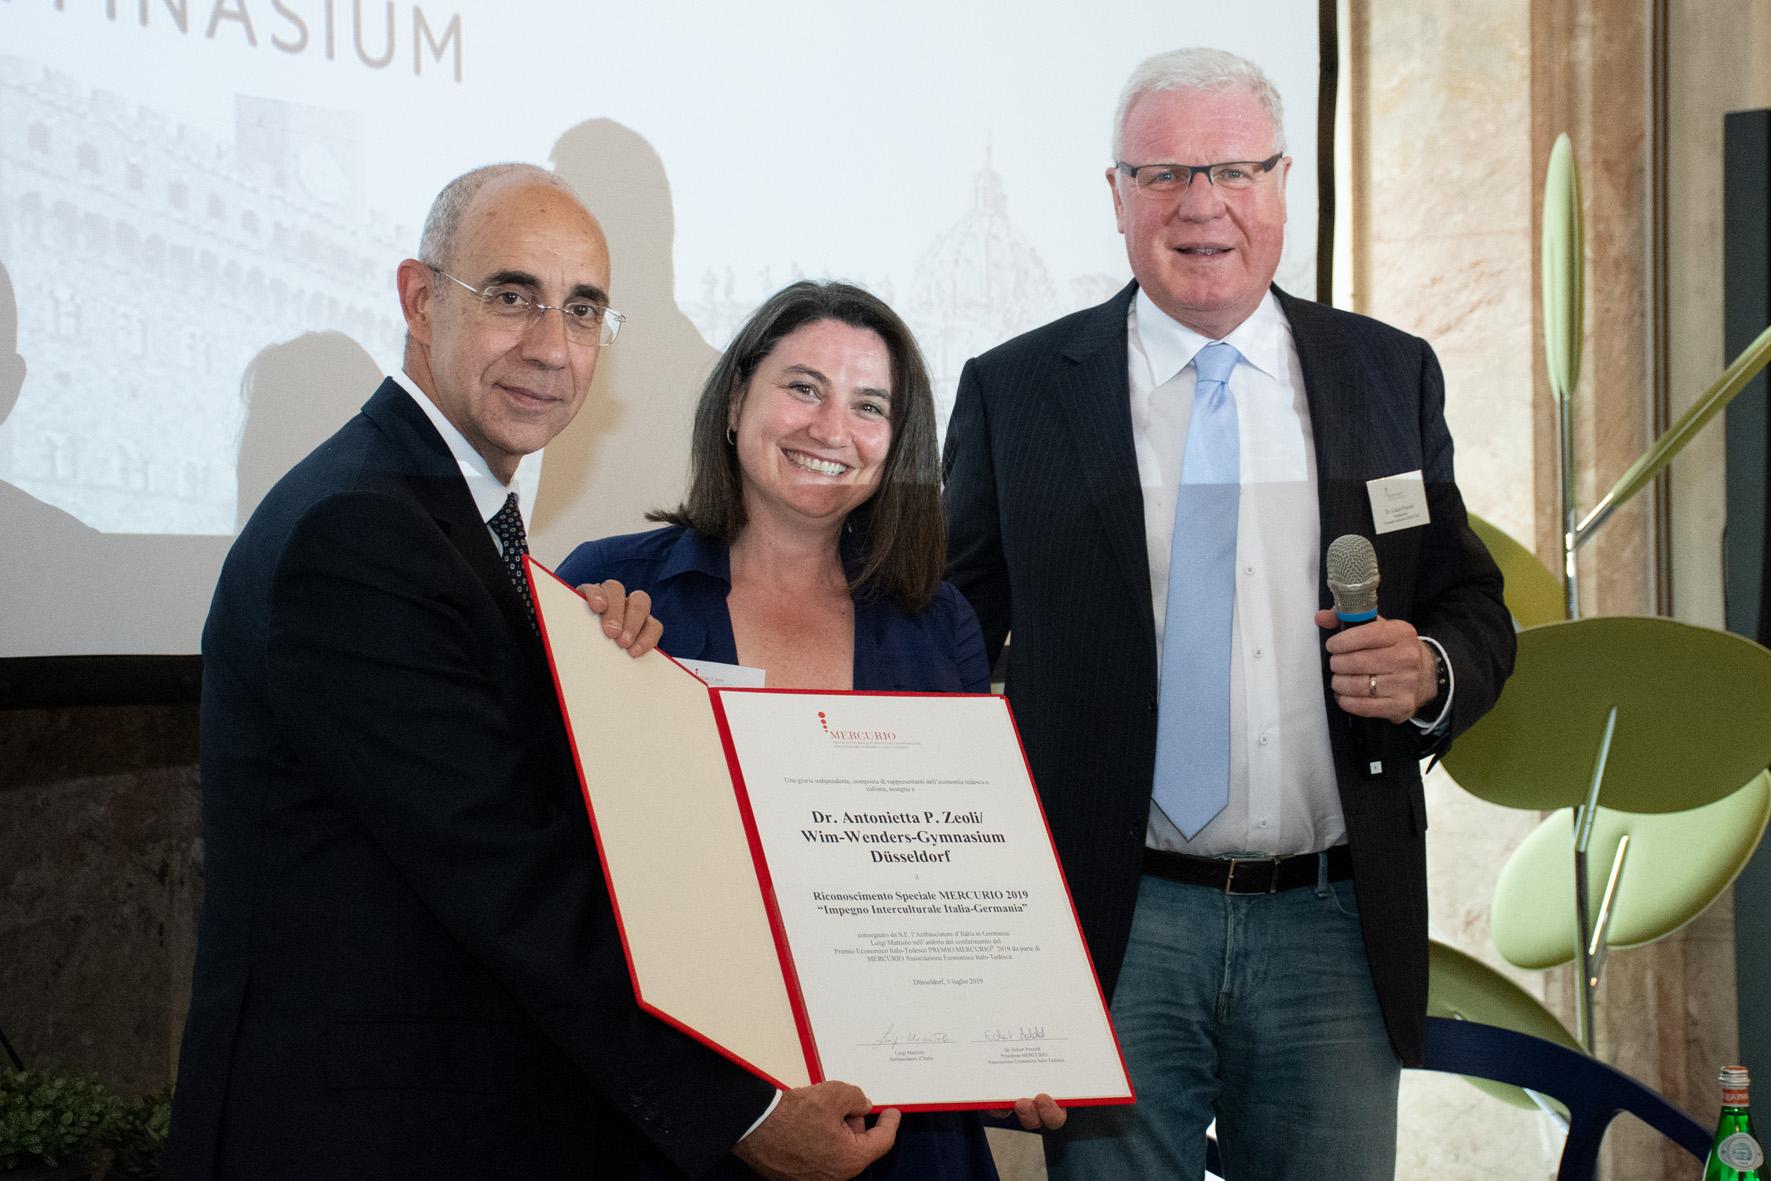 S.E.Luigi Mattiolo, Dr. A. Zeoli (Wim-Wenders-Gymnasium Düsseldorf), Dr. Eckart Petzold (MERCURIO)